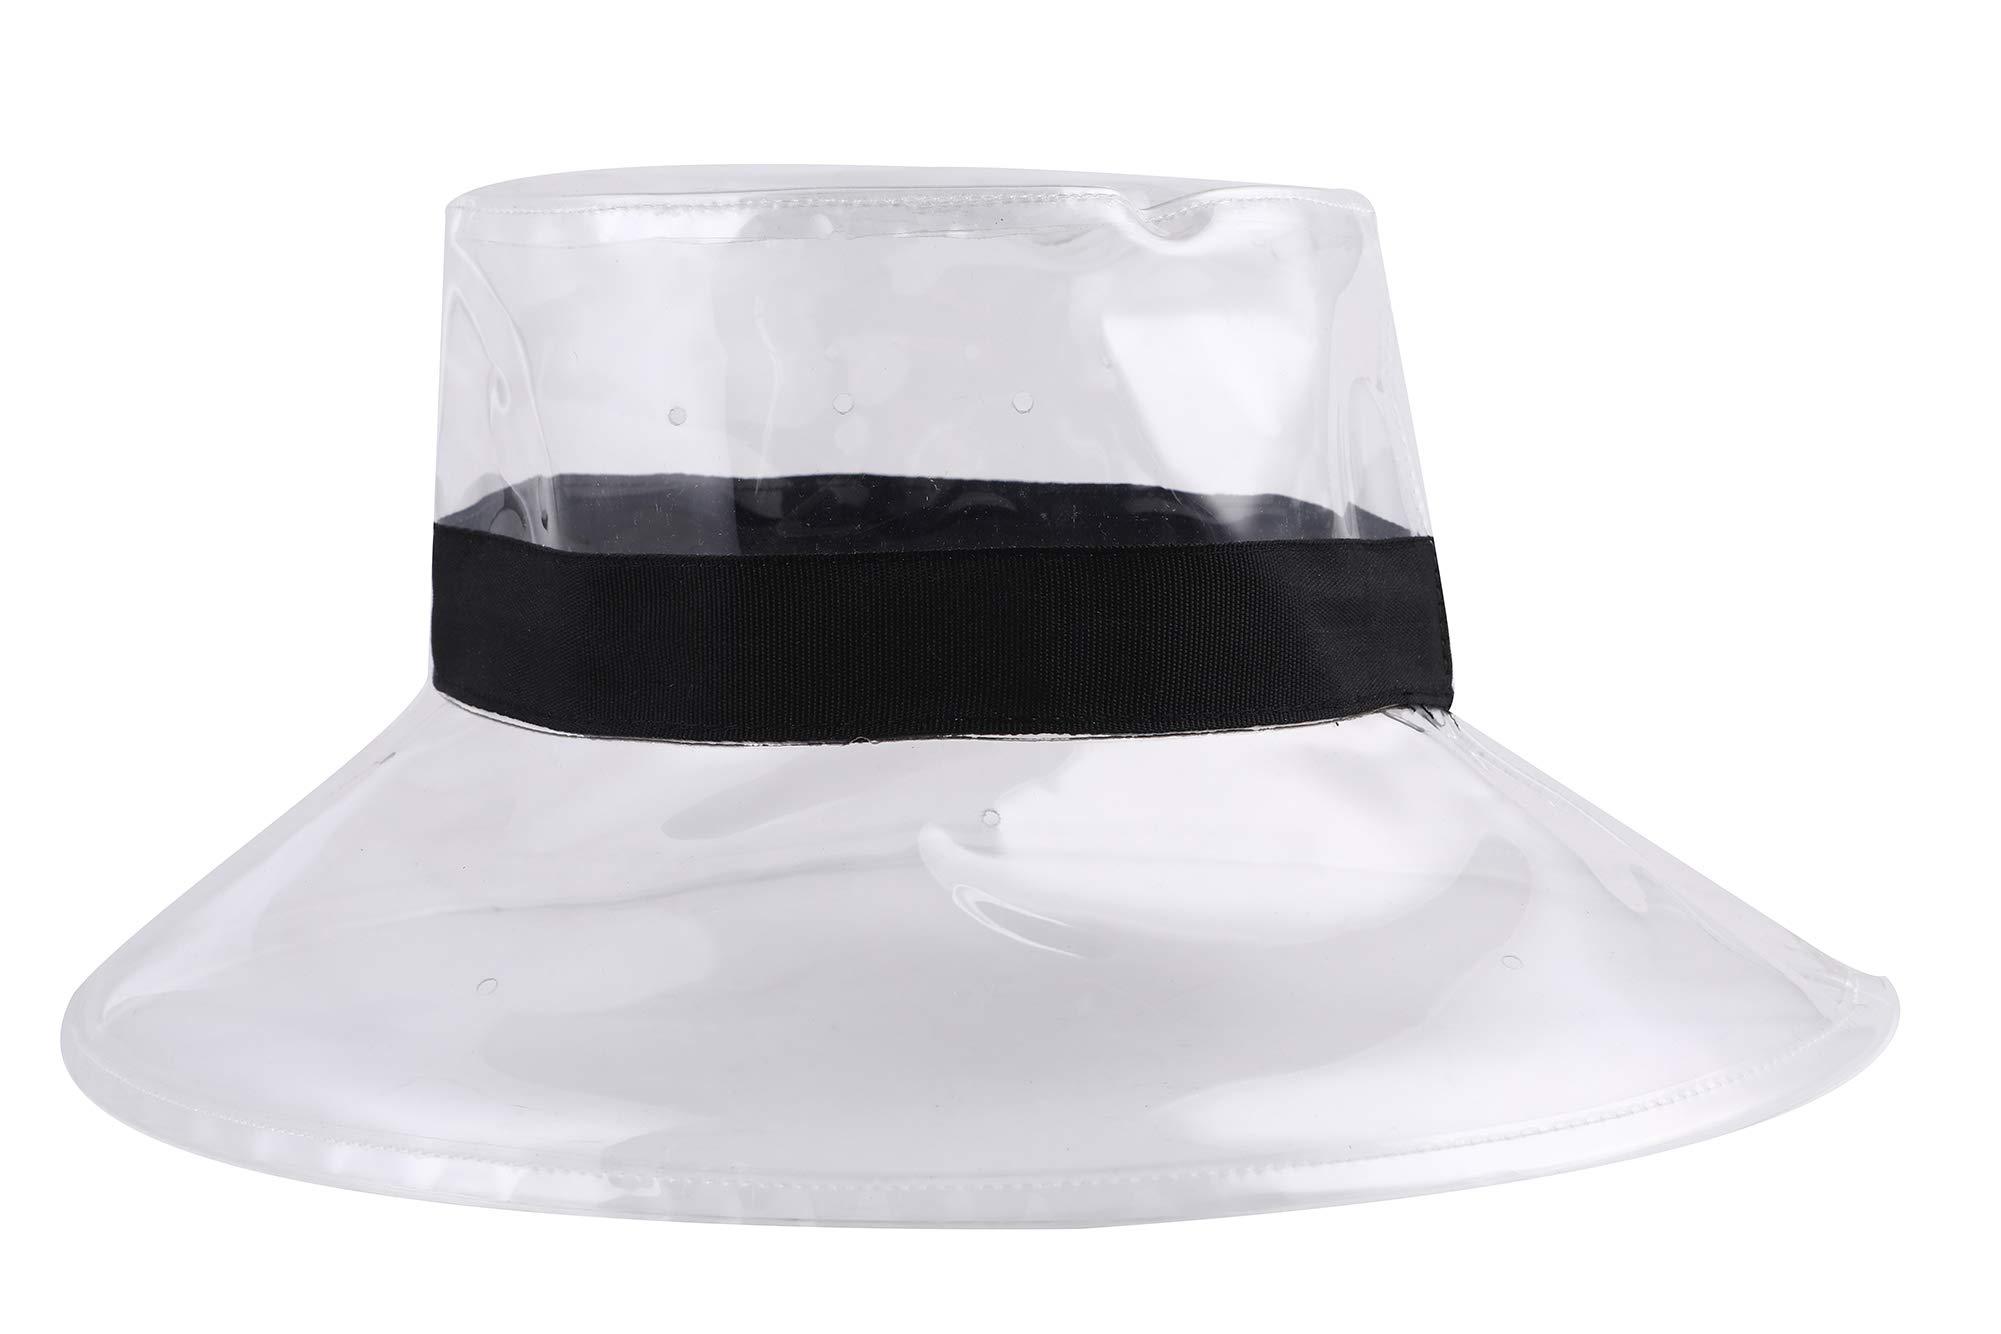 ZLYC Fashion Environmental Protection PVC Wide Brim Bucket Hats Waterproof Rain Hats (White)